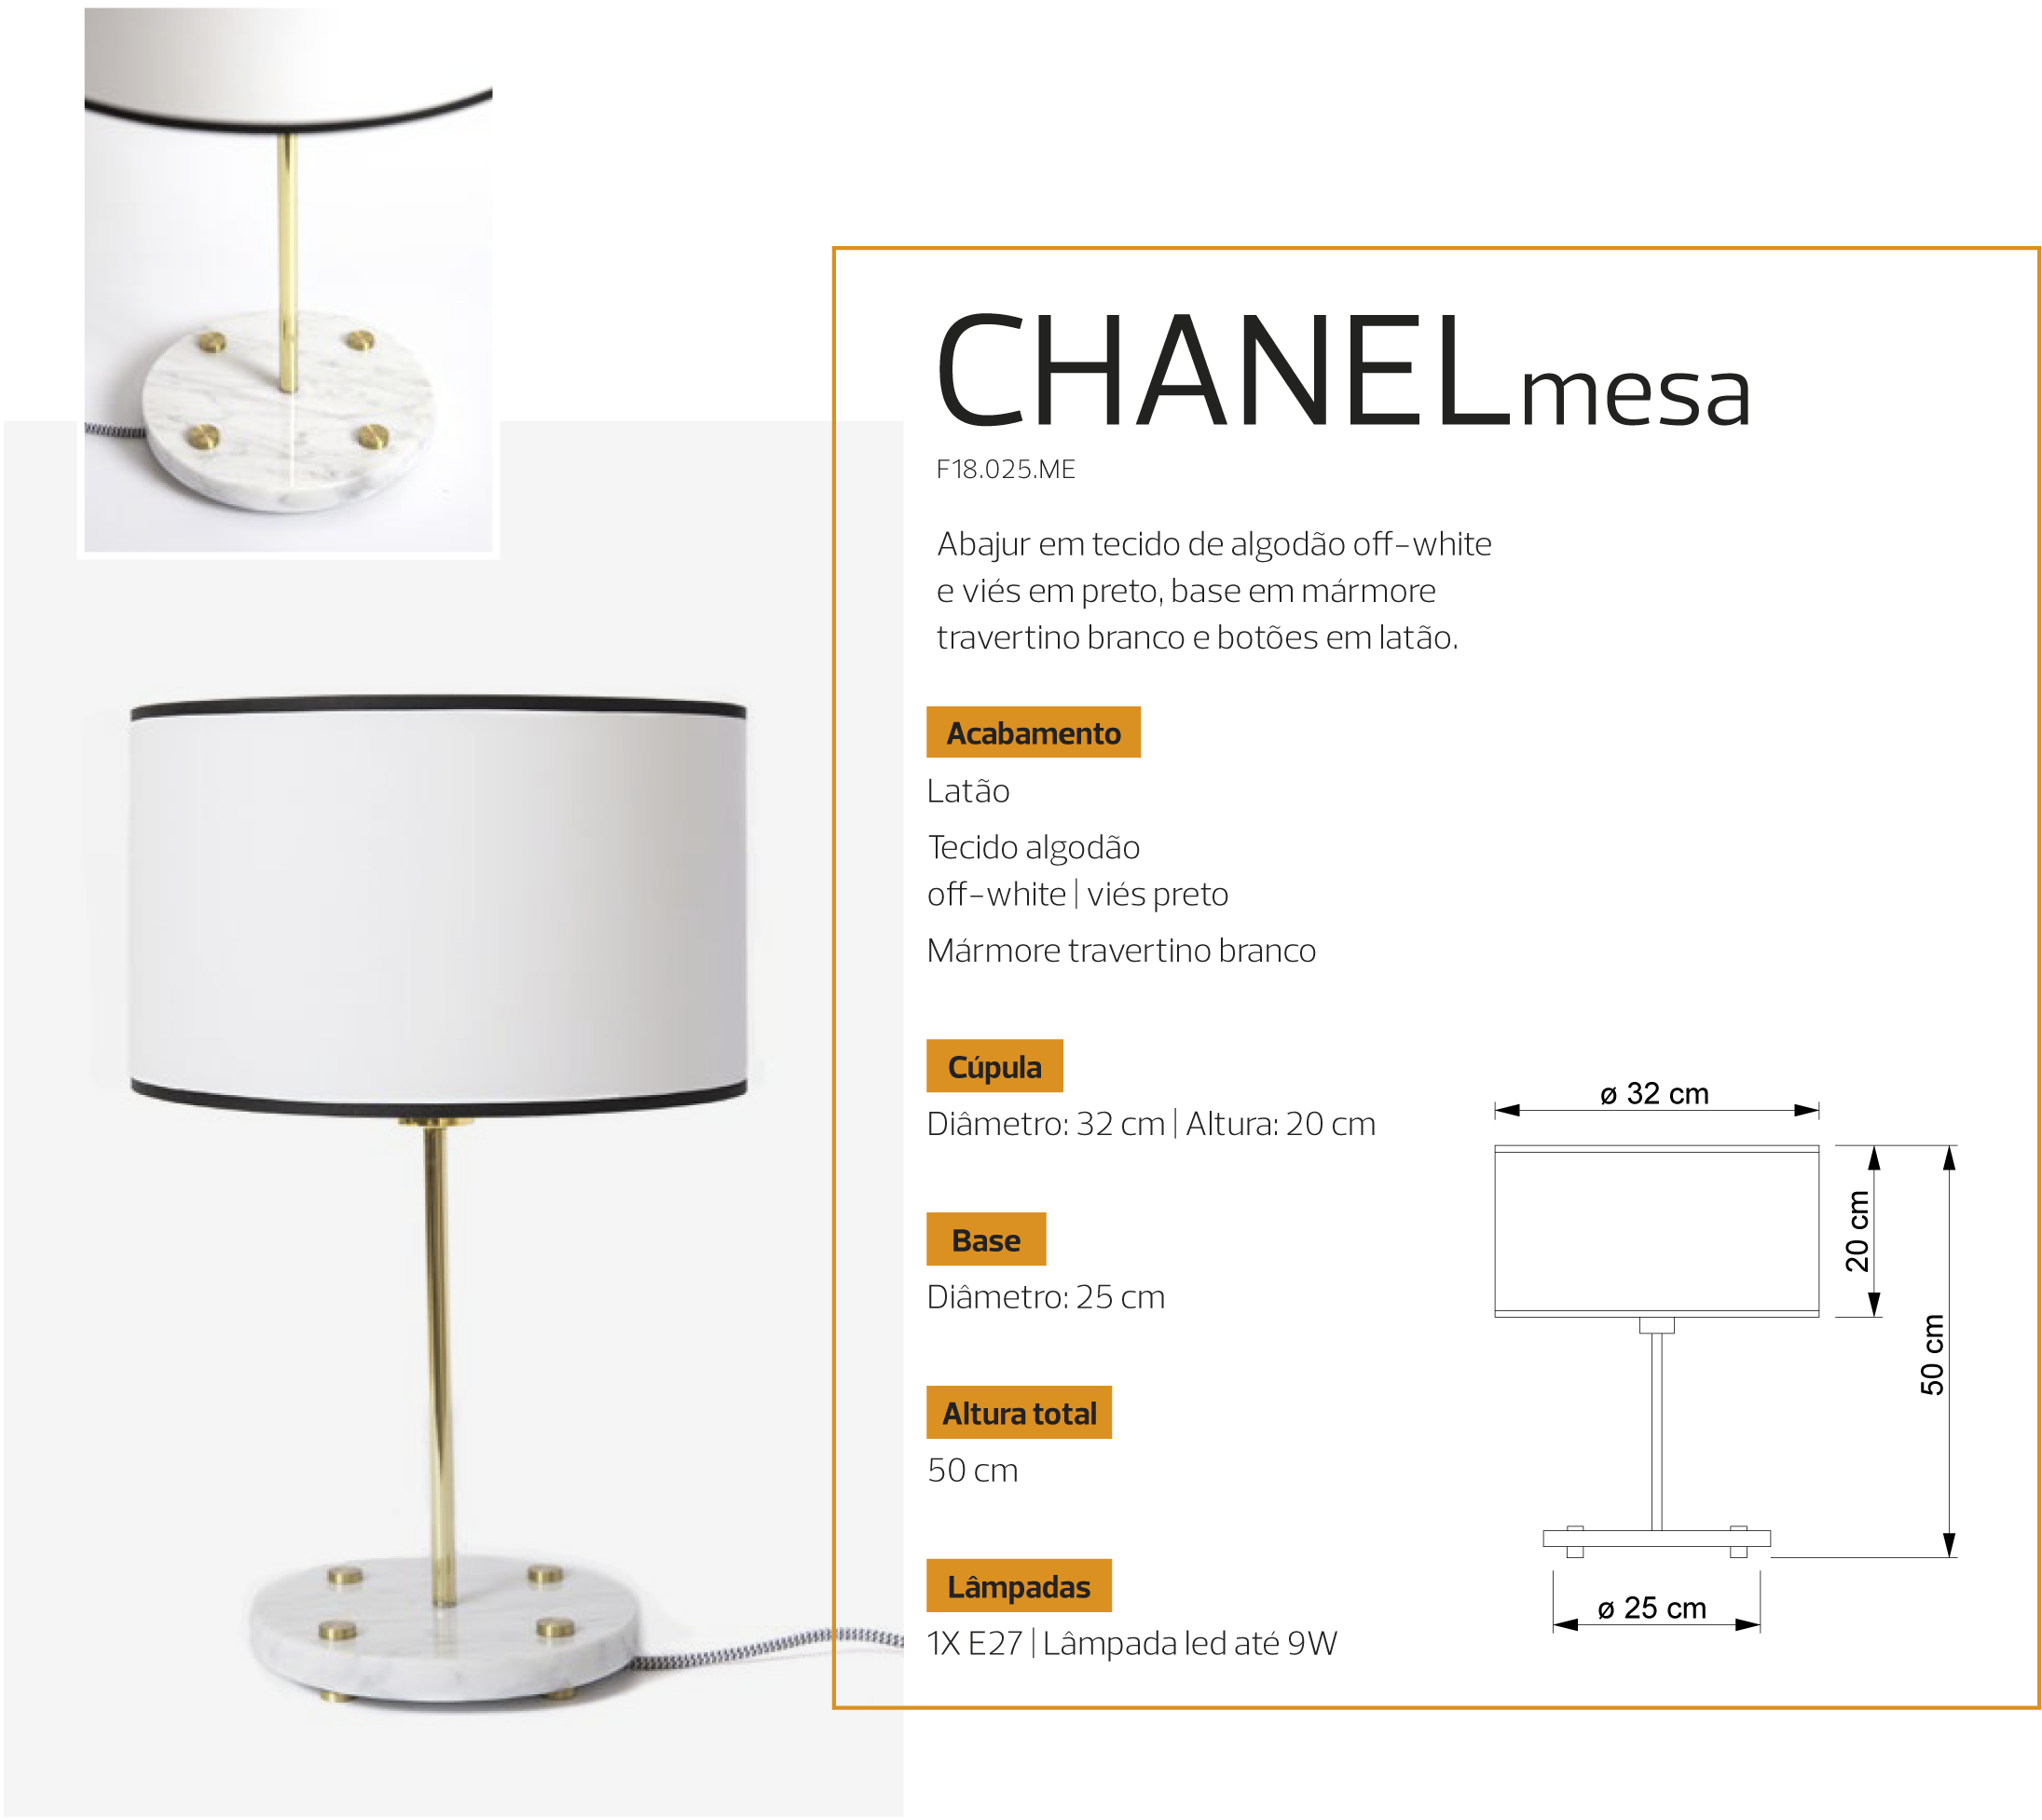 Chanel Mesa